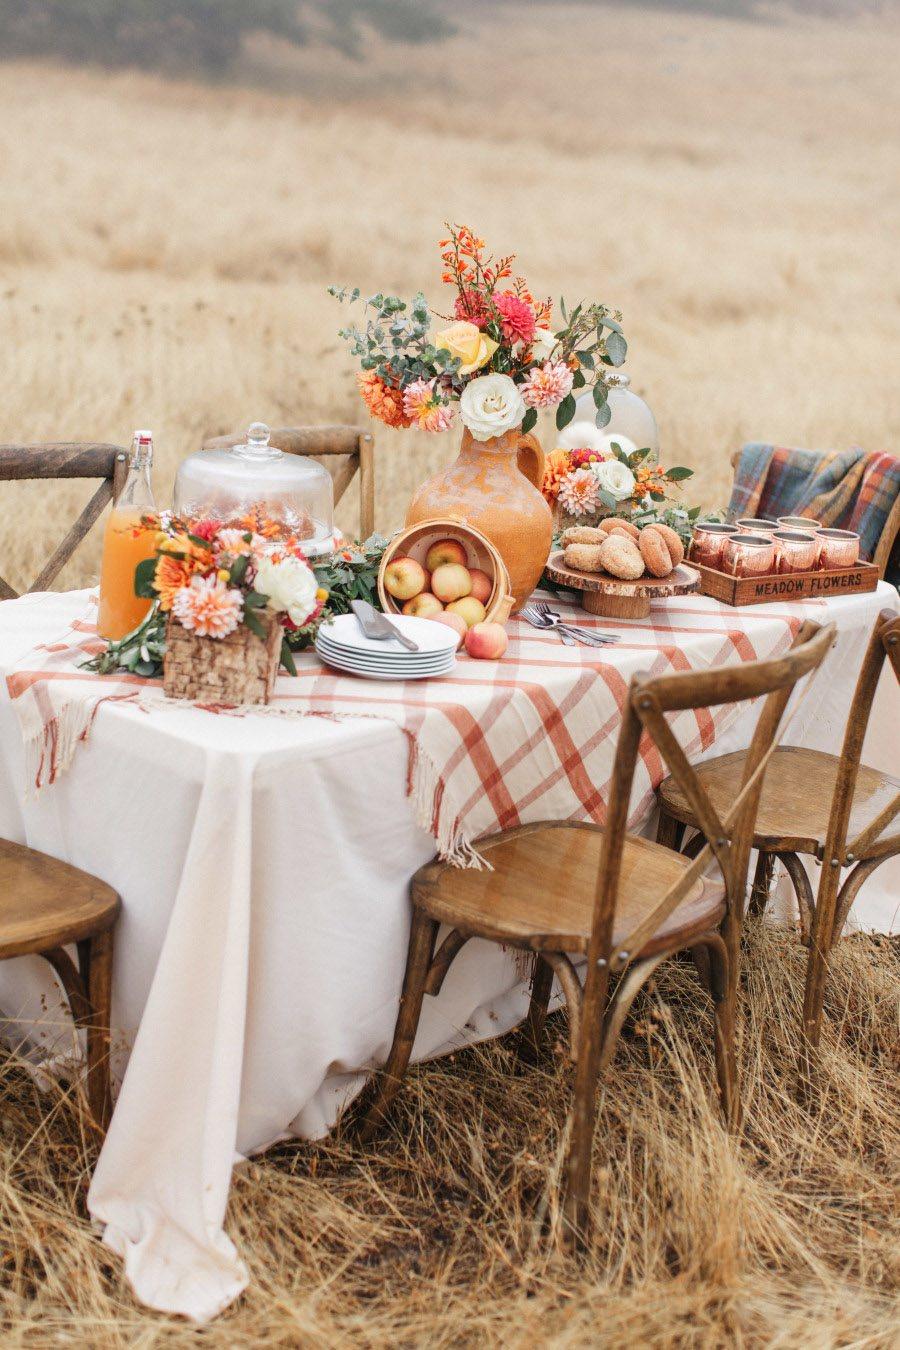 PICNIC DE OTOÑO picnic-de-otoño